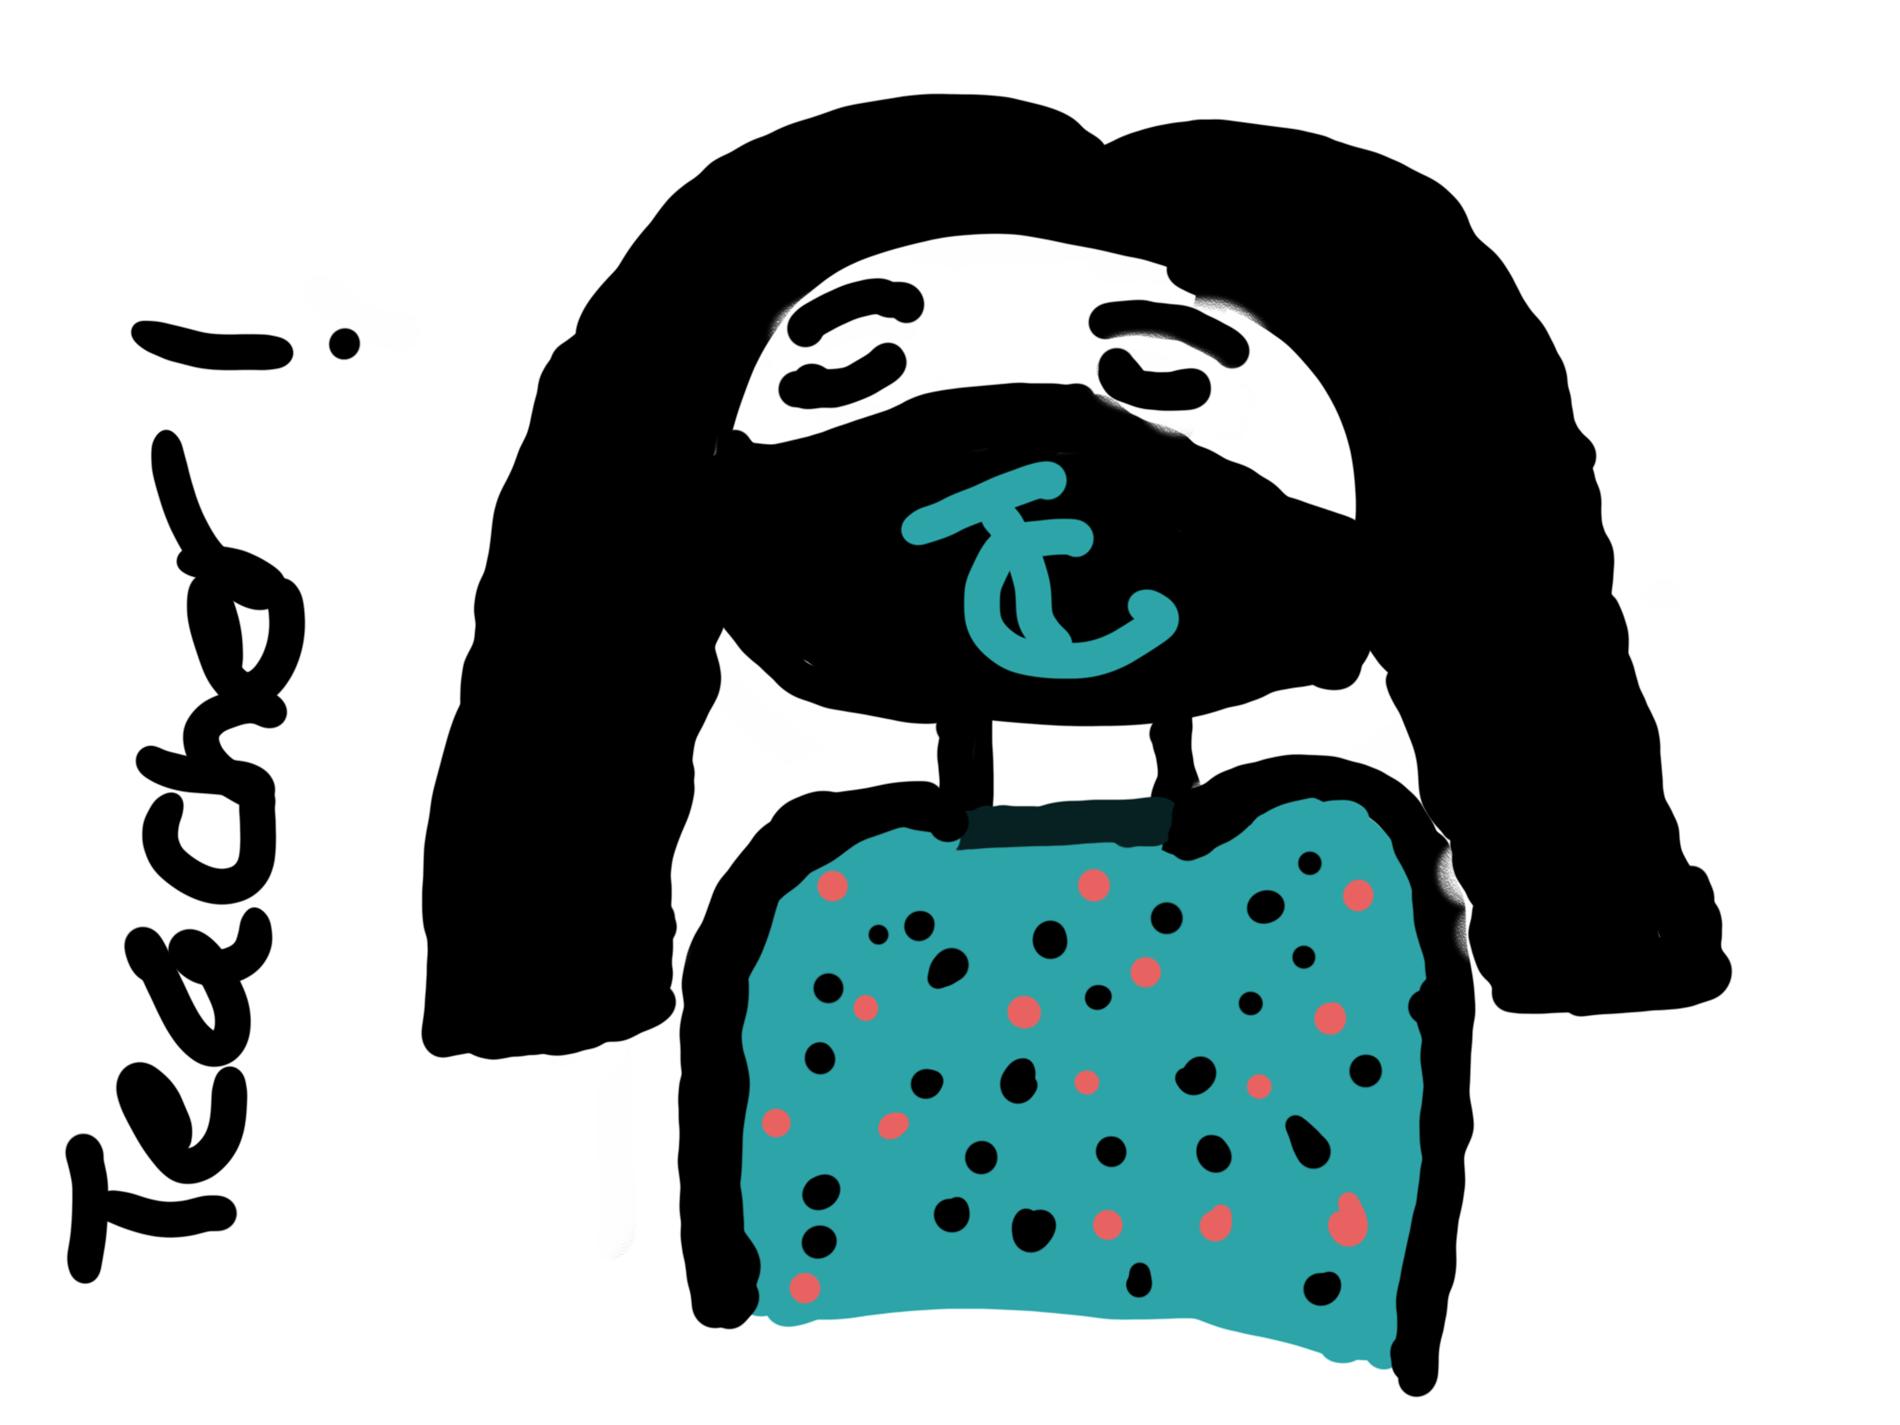 Digital Drawing for WEEK 10 (5th Grade)